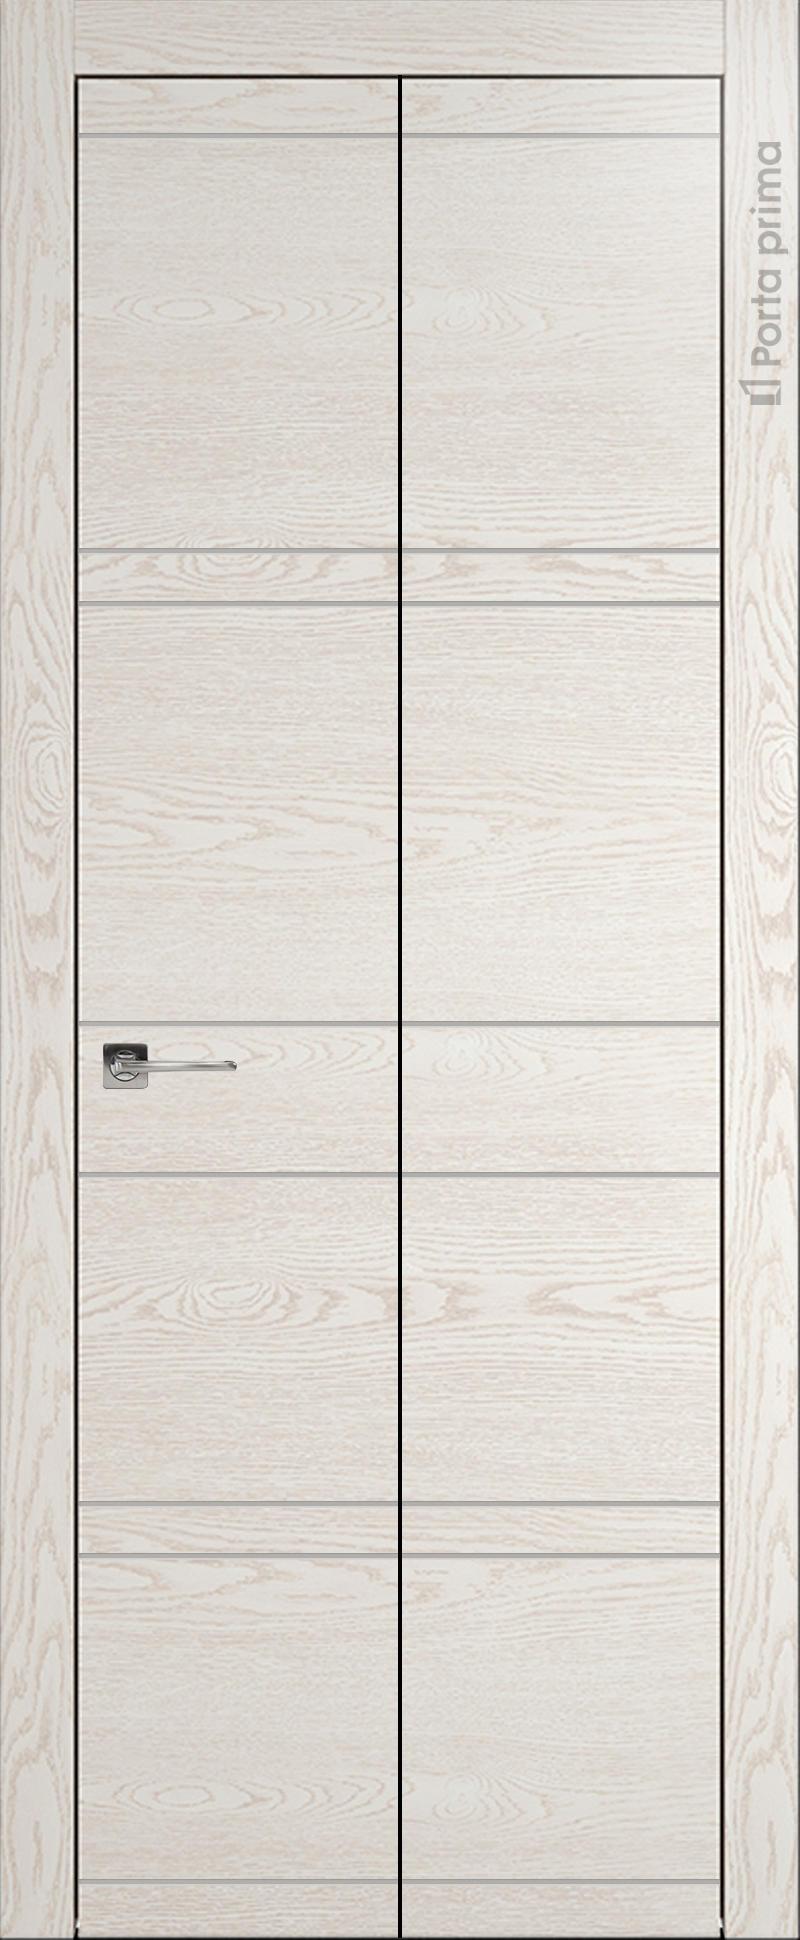 Tivoli Е-2 Книжка цвет - Белый ясень Без стекла (ДГ)